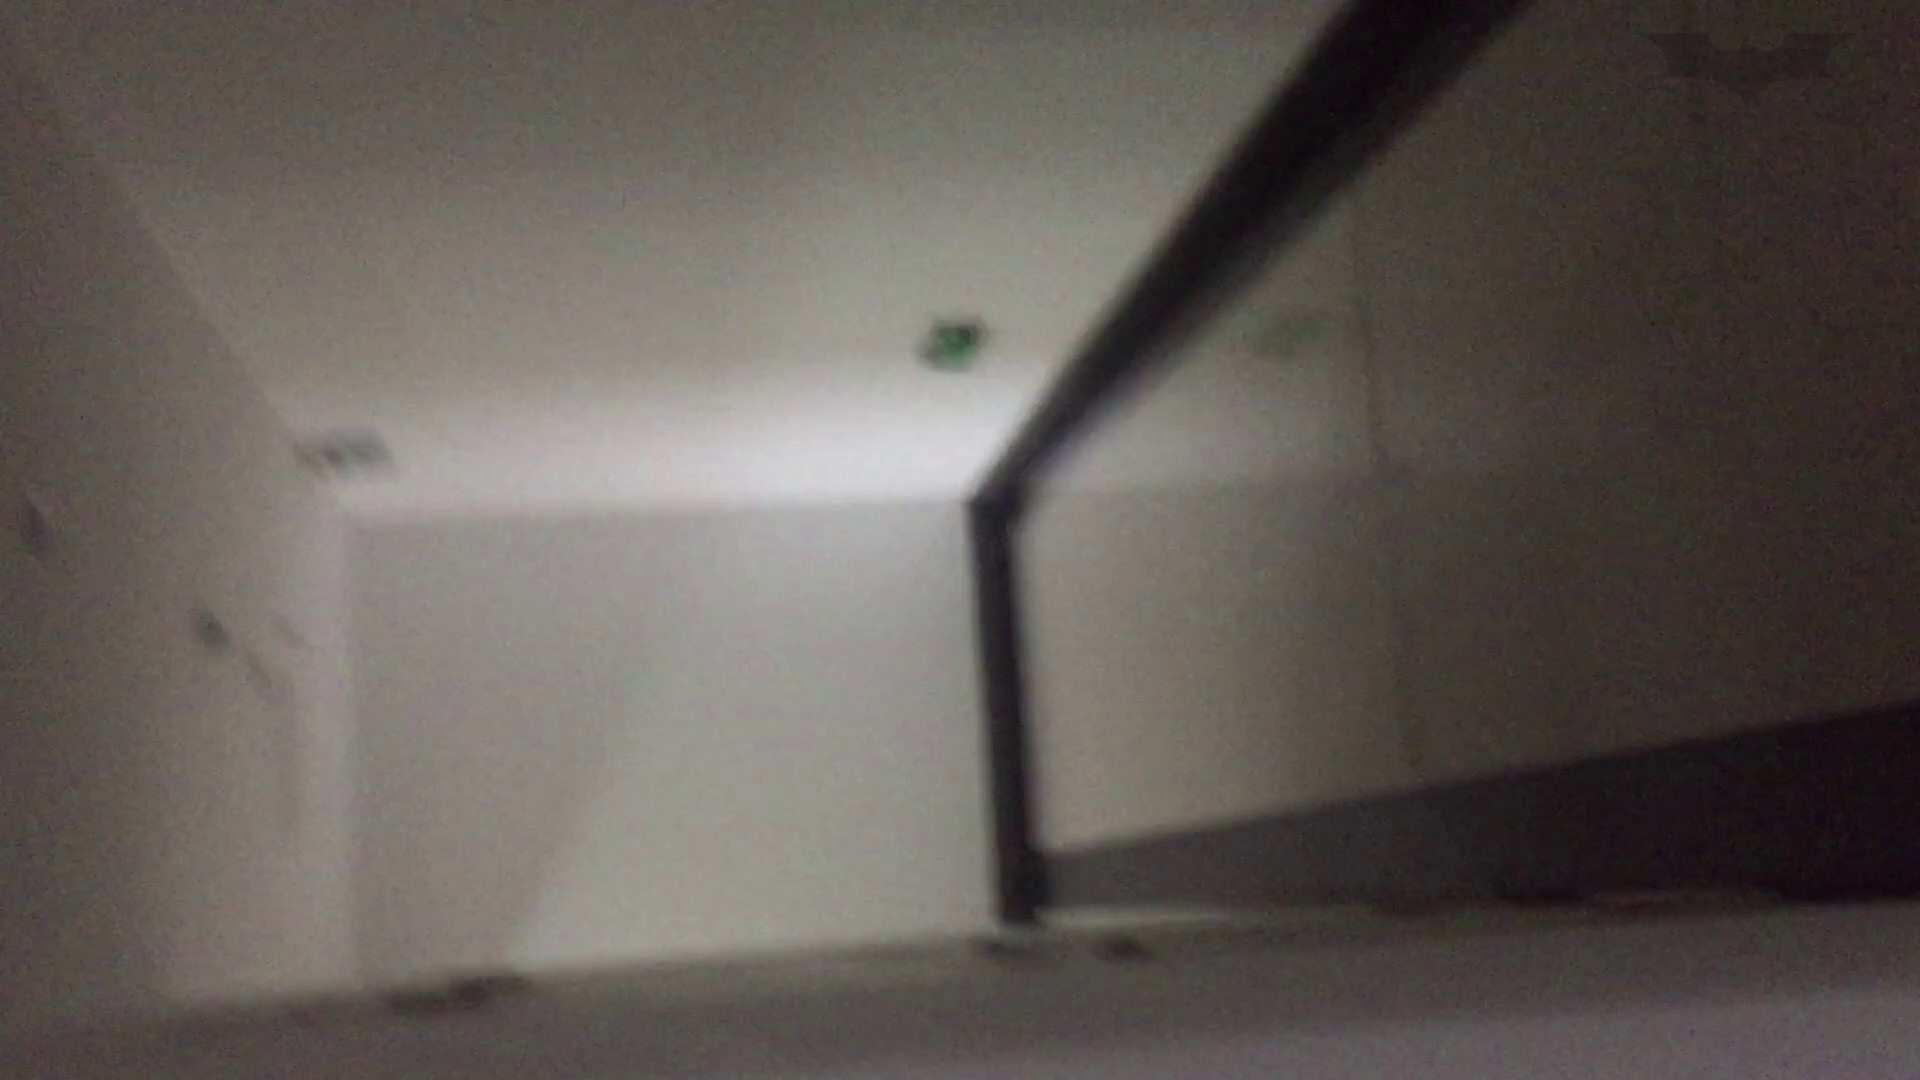 JD盗撮 美女の洗面所の秘密 Vol.73 美肌 おめこ無修正動画無料 105画像 14